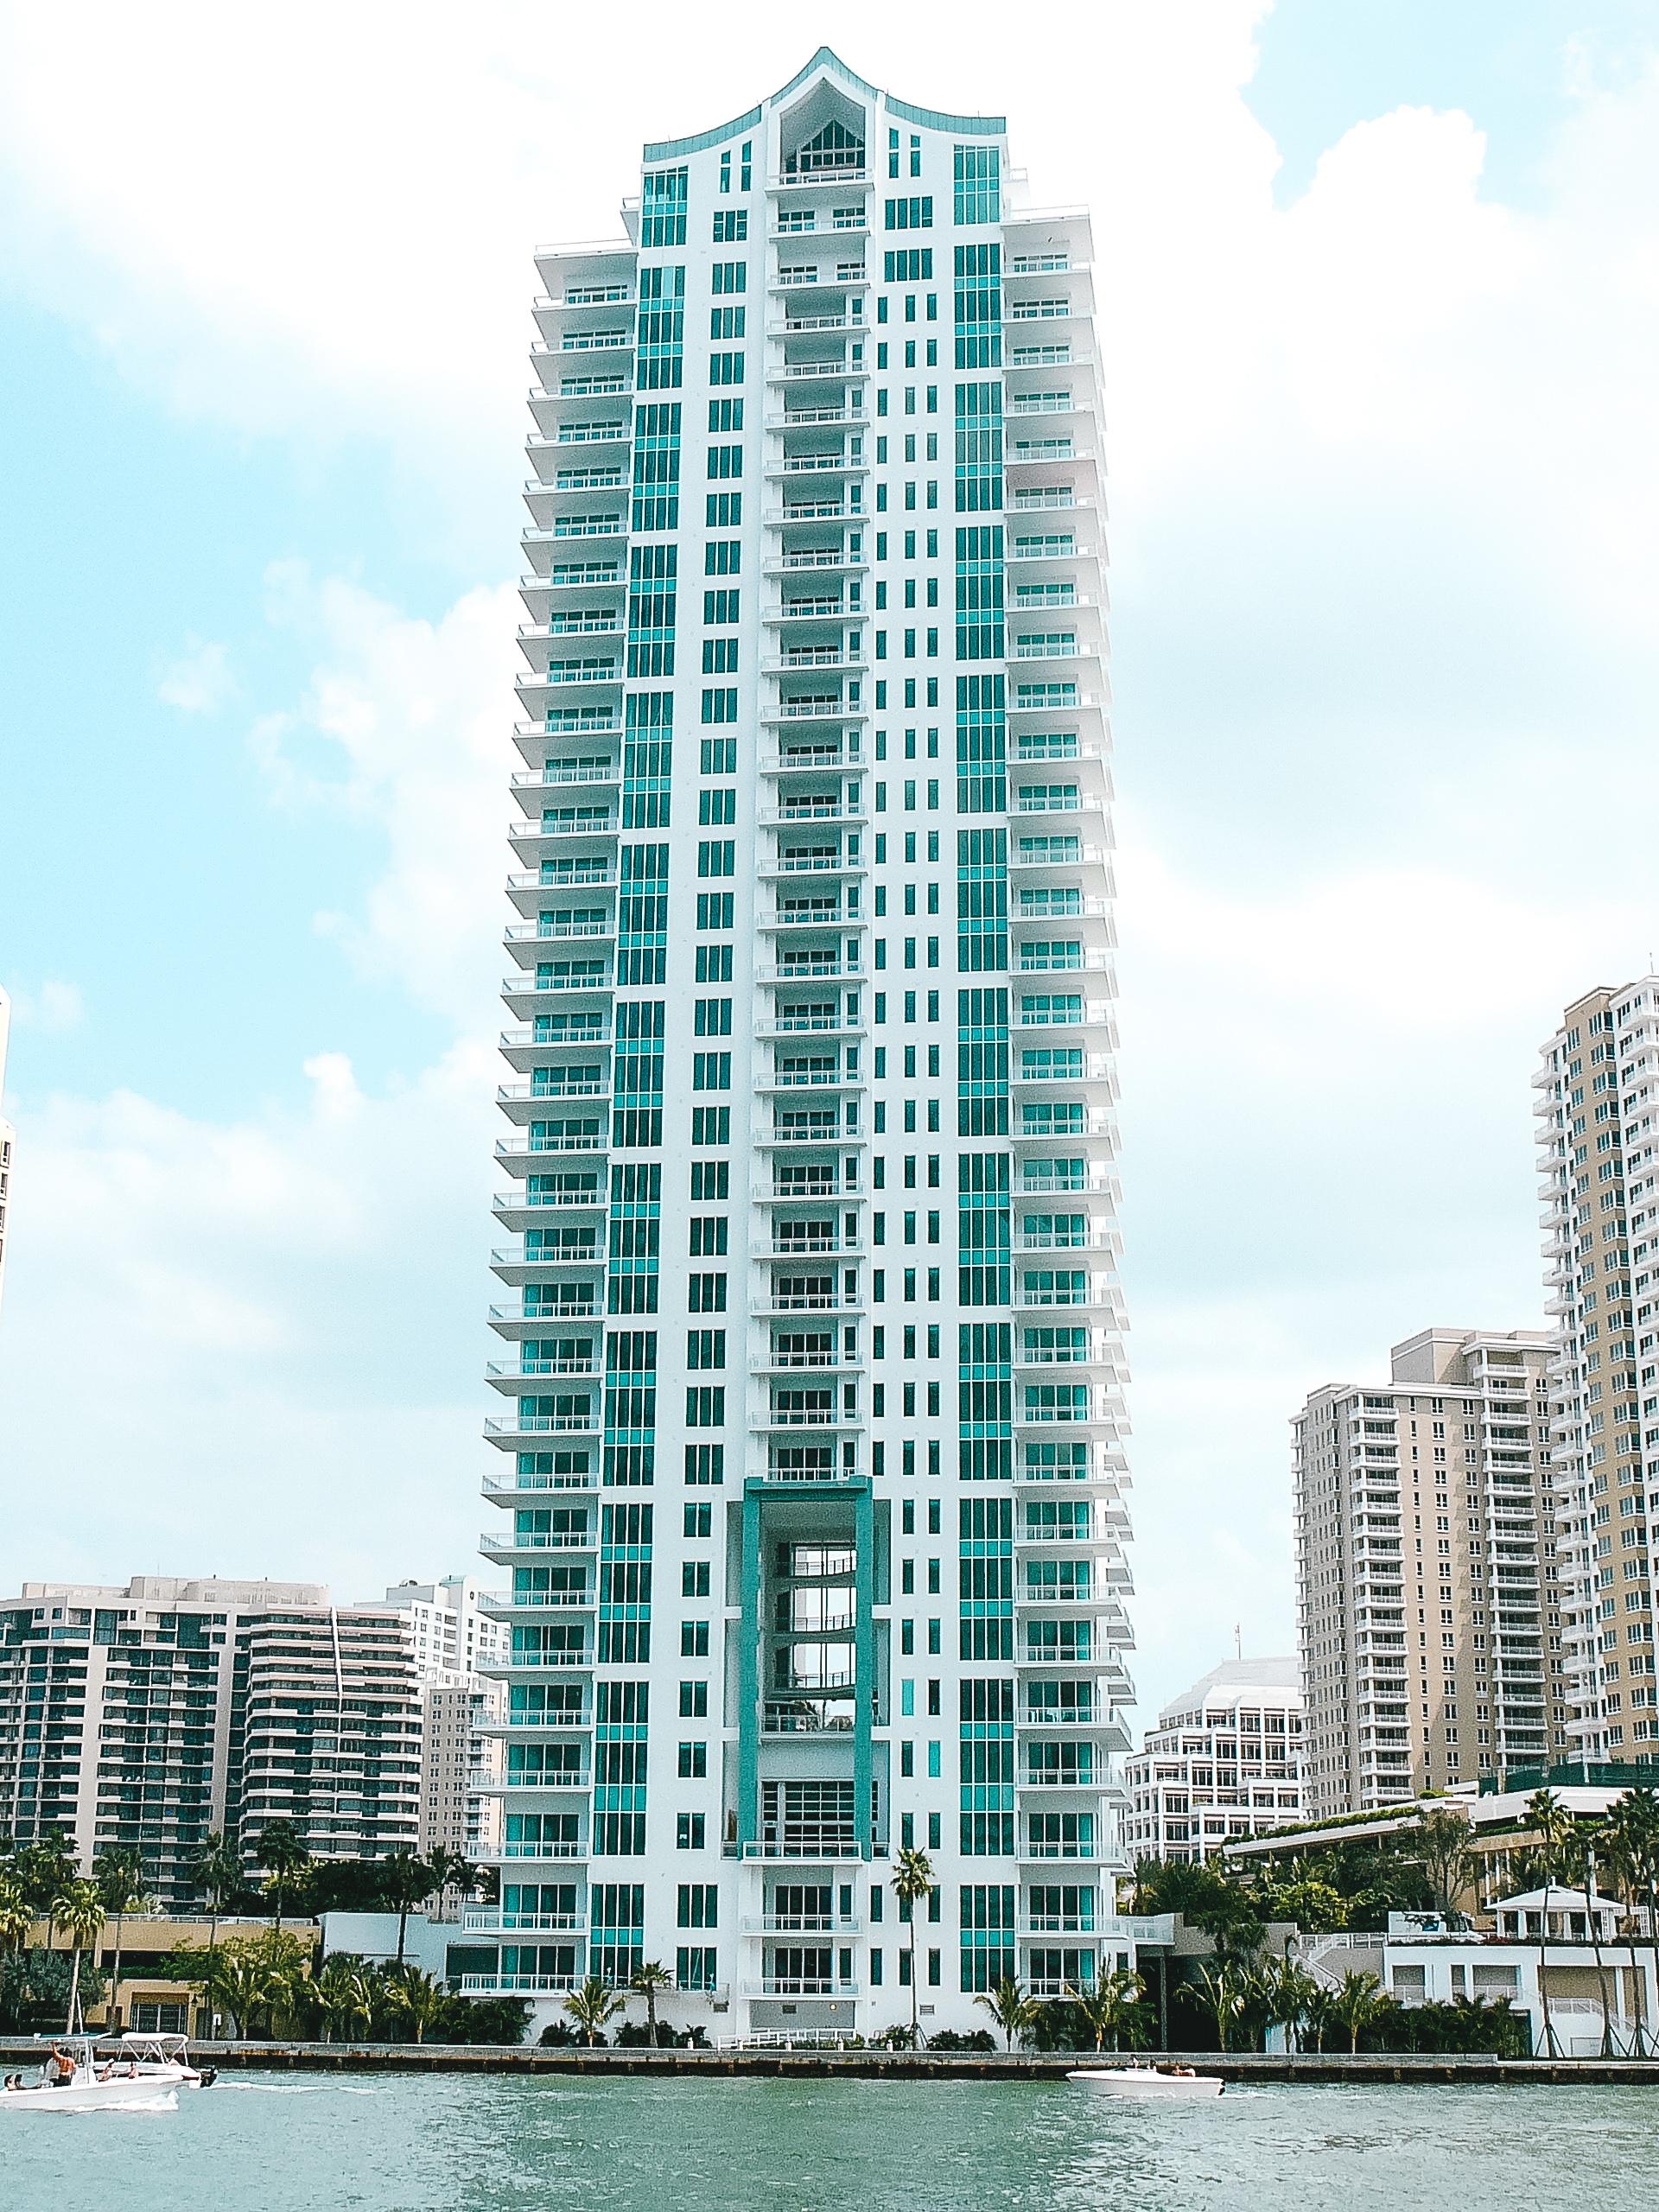 Asia Condominium - Address: 900 Brickell Key Blvd., Miami, FL 33131Number of Units: 123Info: Aracely Euceda